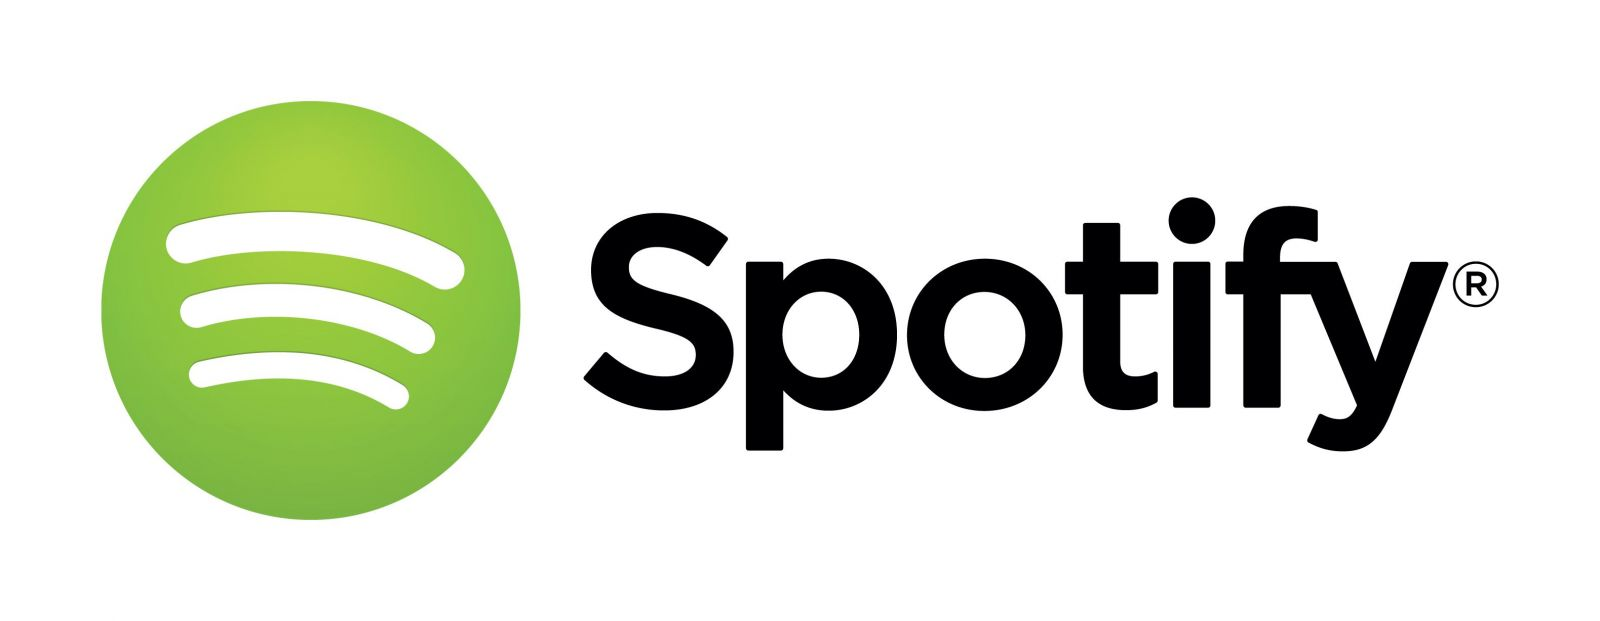 Uber vs Taxify či Spotify vs. Apple music. Porovnali jsme služby